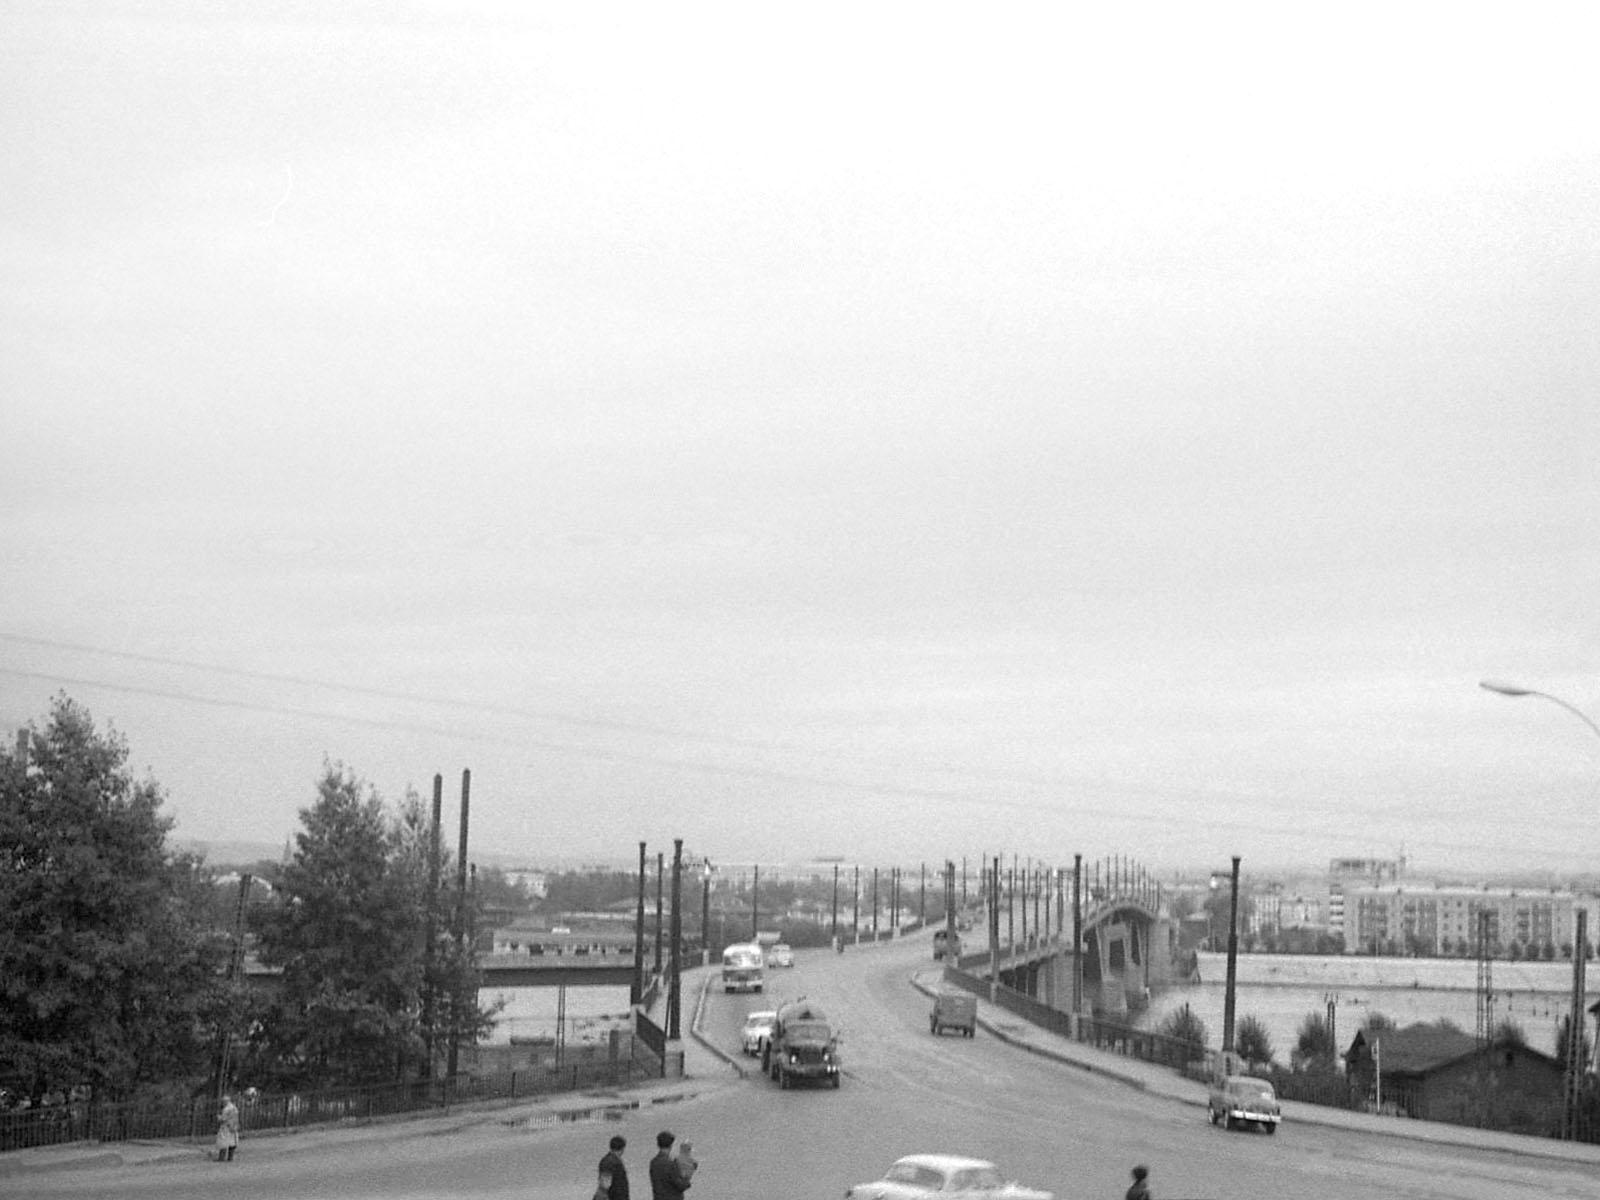 1970. Глазковский мост с видом на бульвар Гагарина. Август